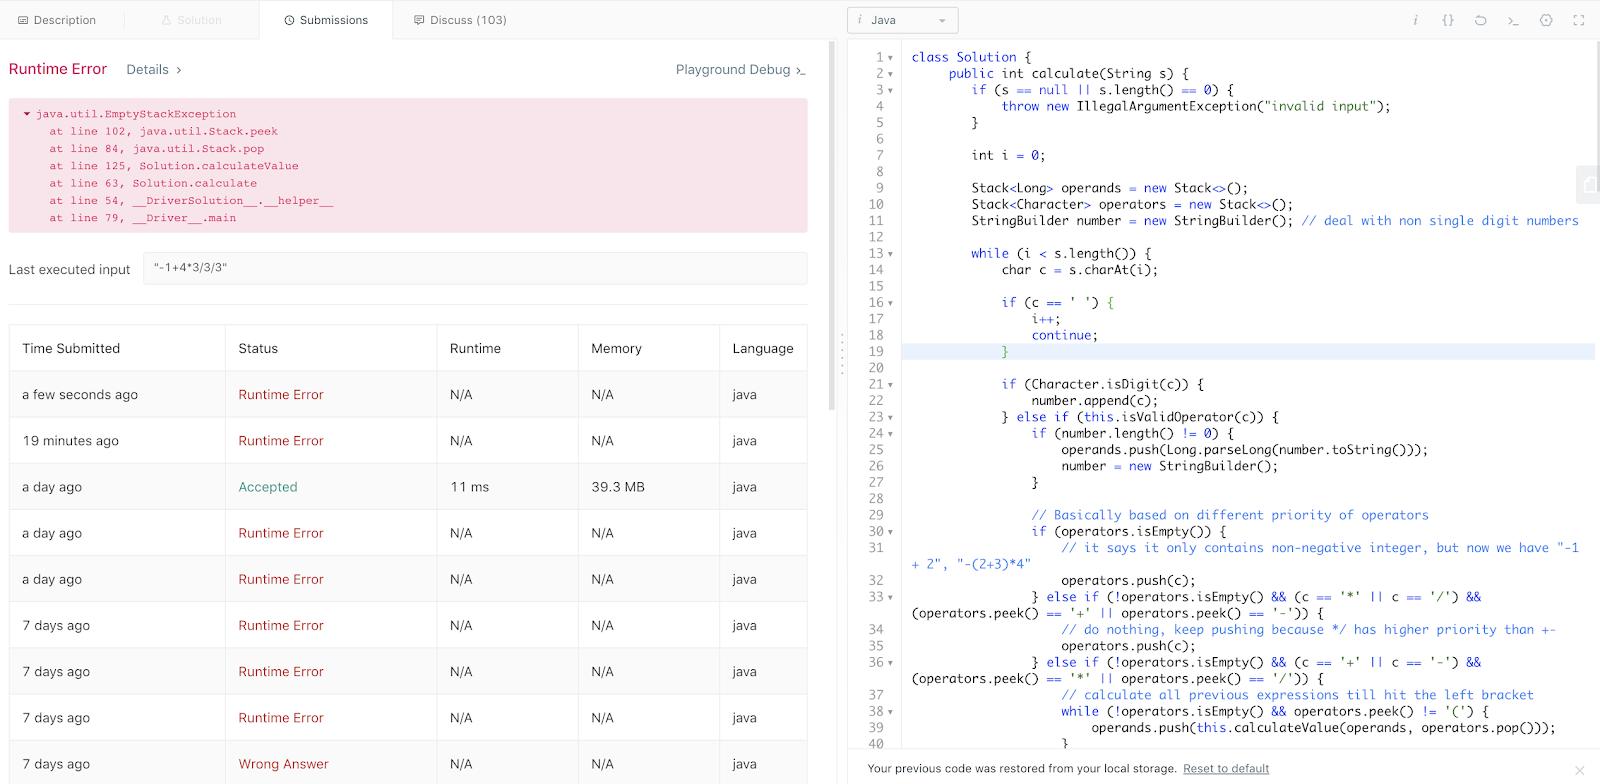 Baozi Training Blog (包子IT面试培训博客): Leetcode solution